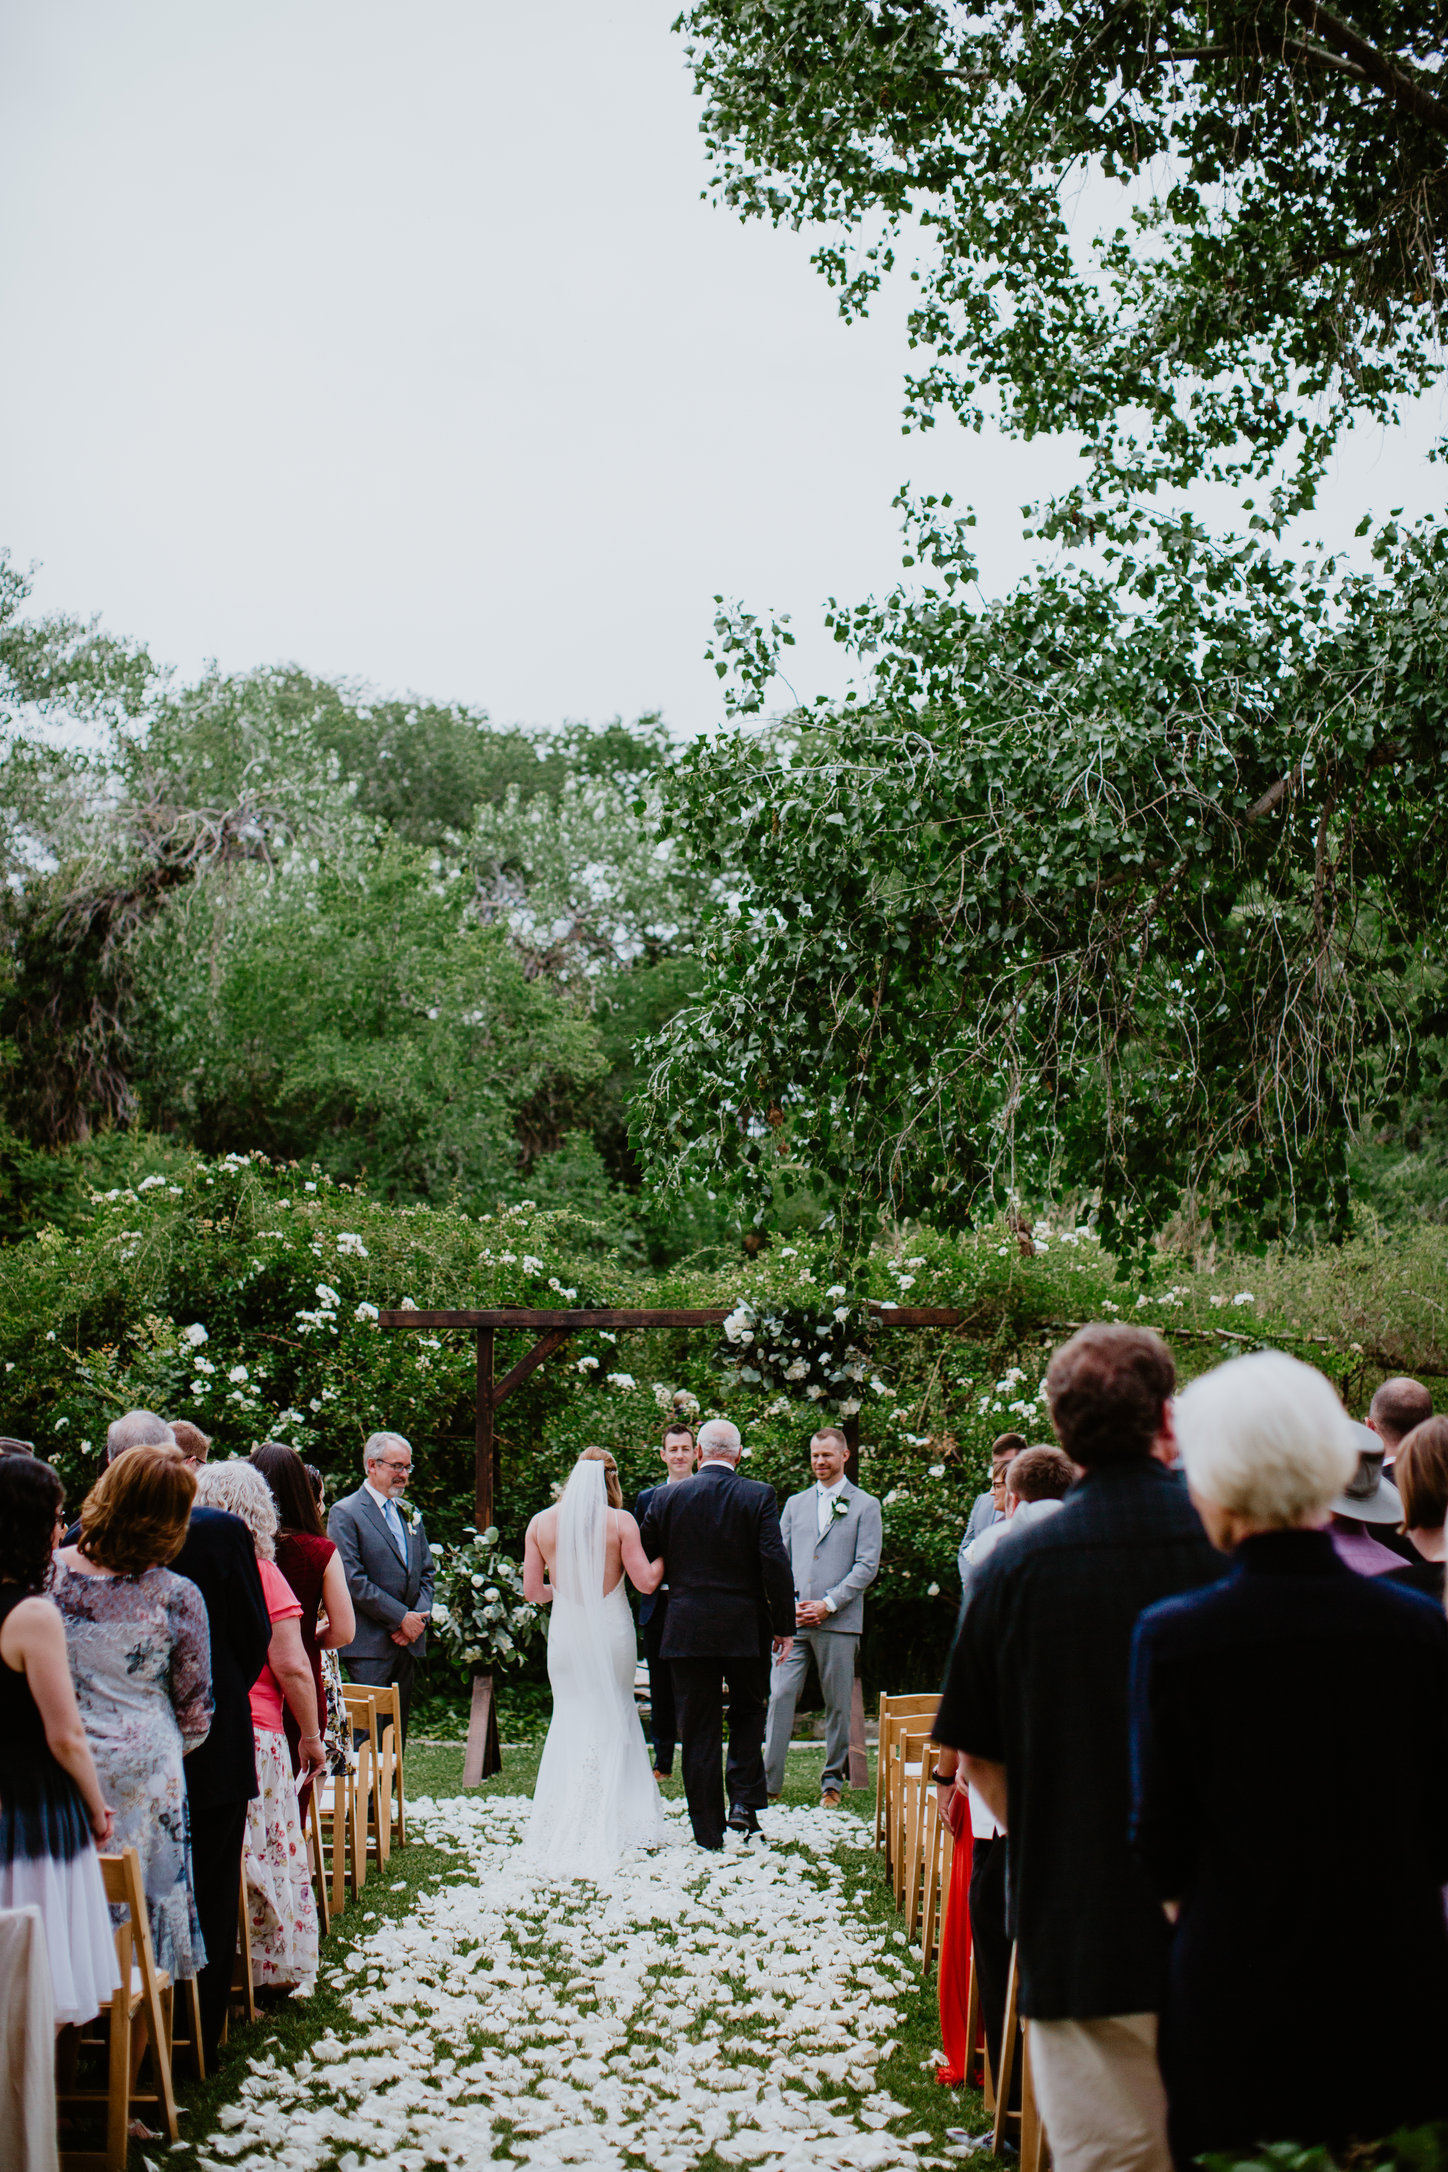 DandA-wedding-233.jpg